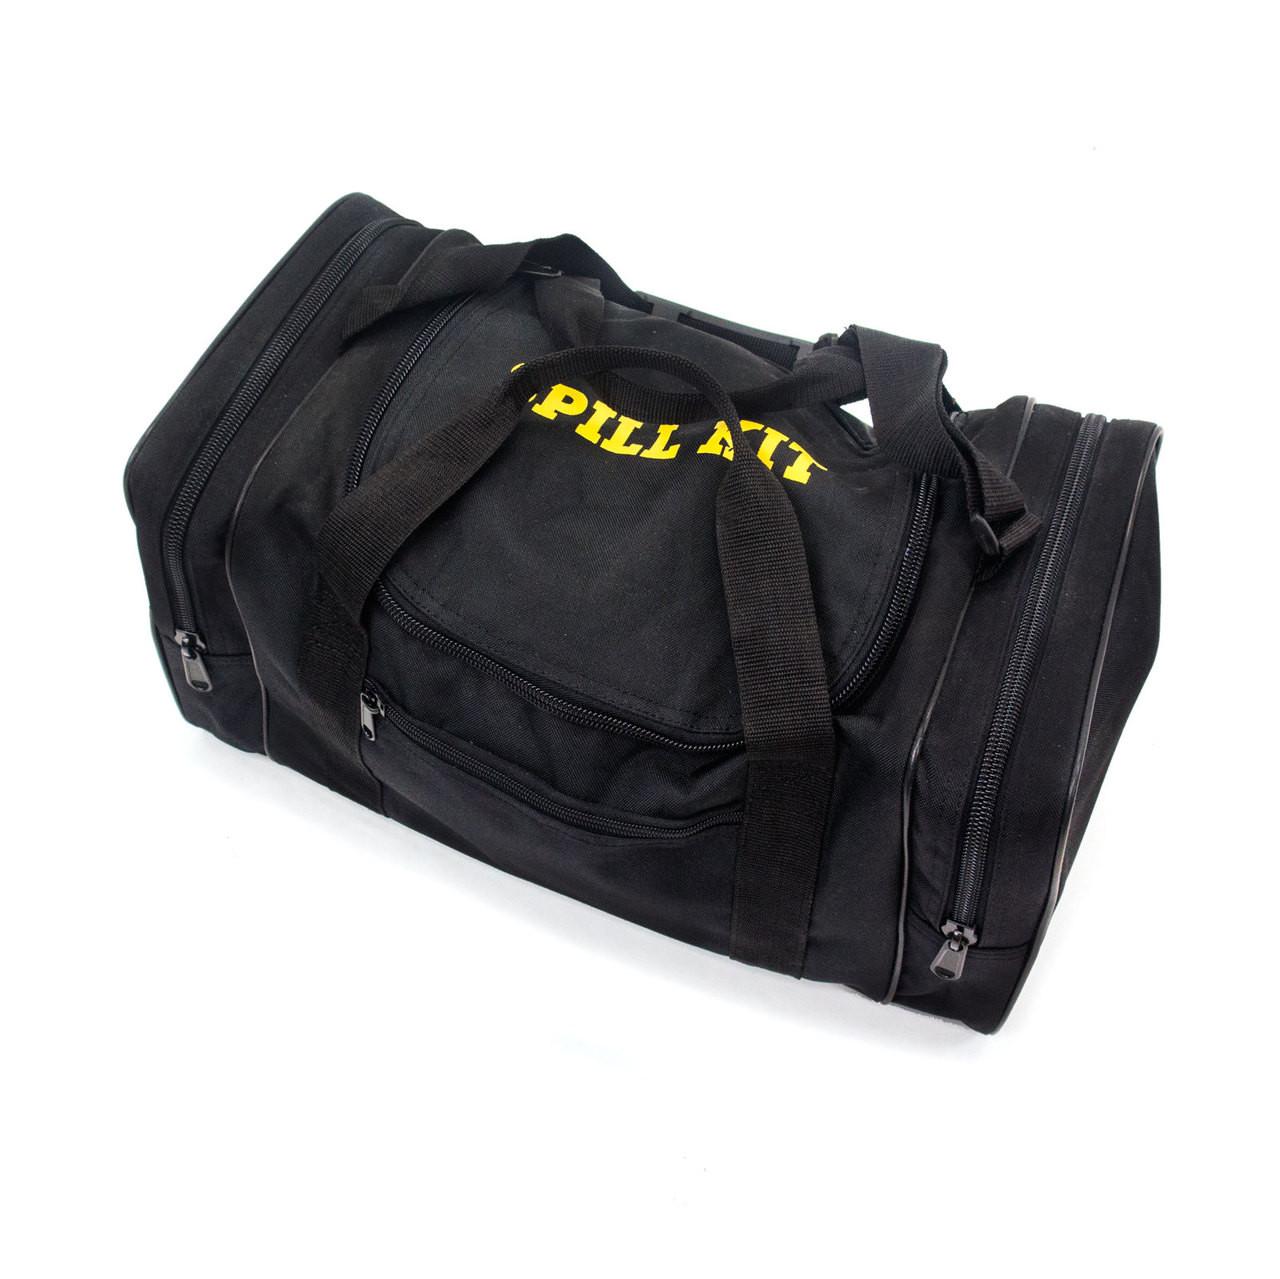 Universal Black Duffle Spill Kit